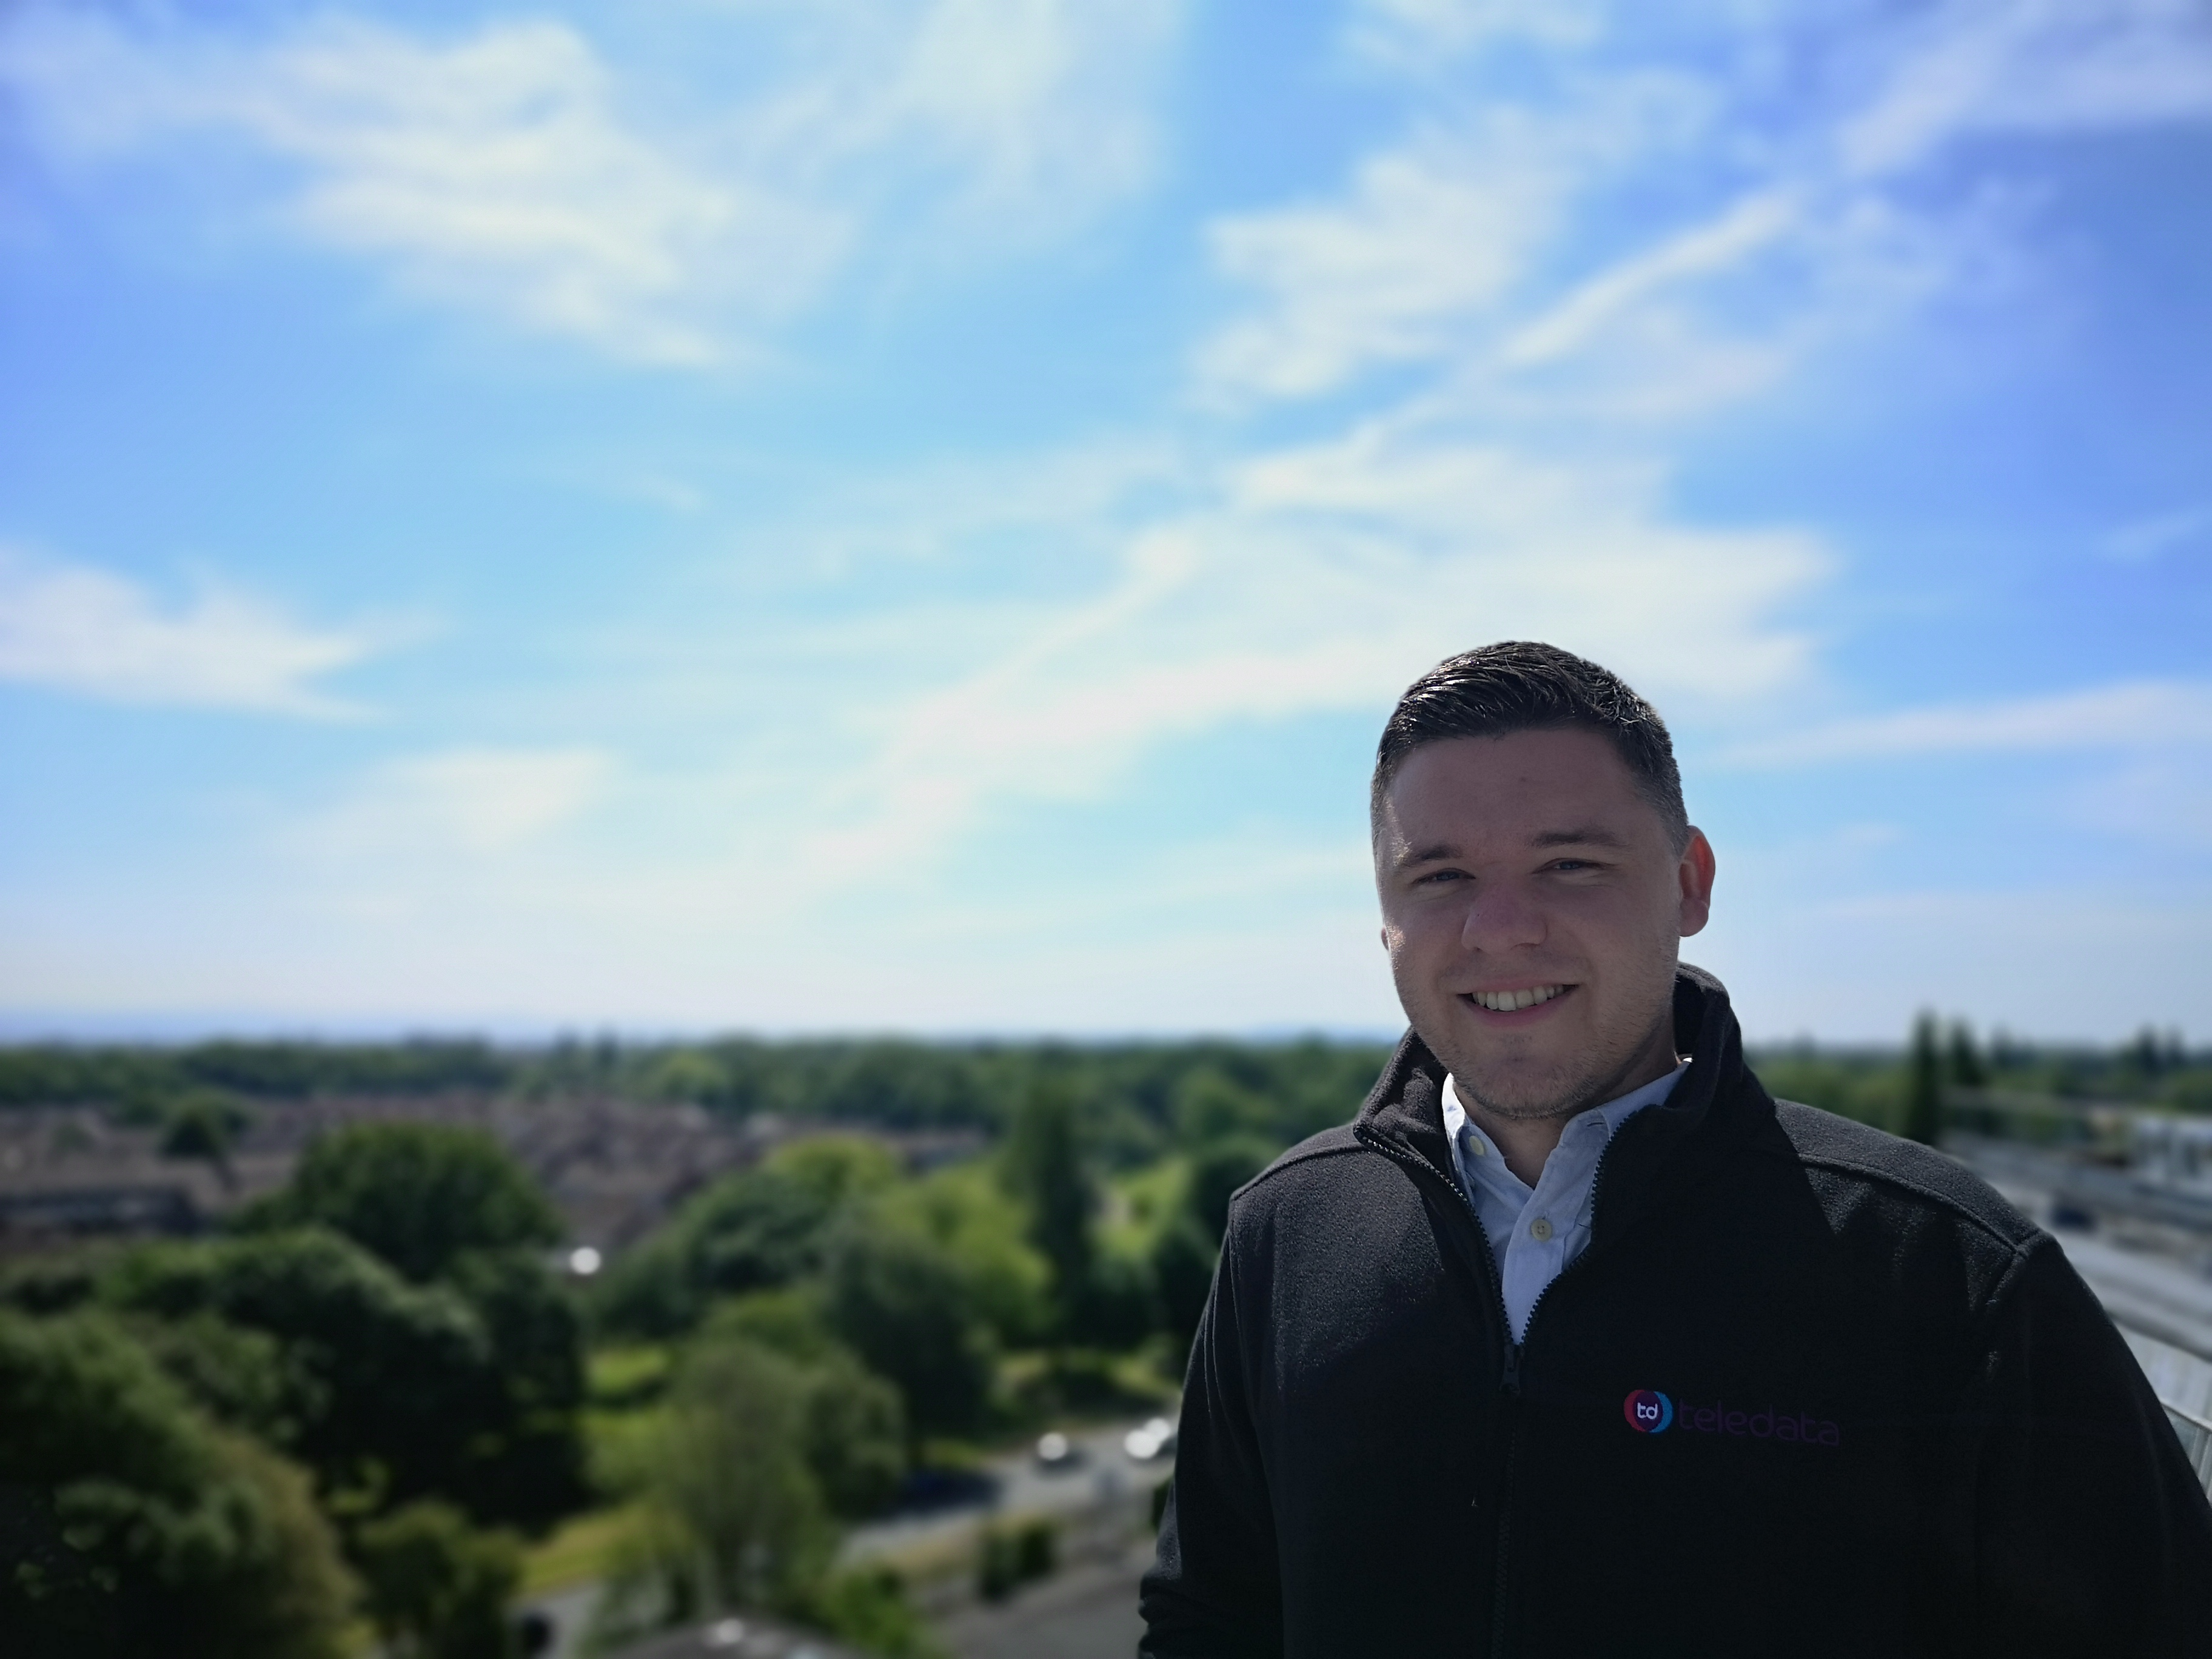 Teledata Hires Seb Graham as Commercial Development Manager